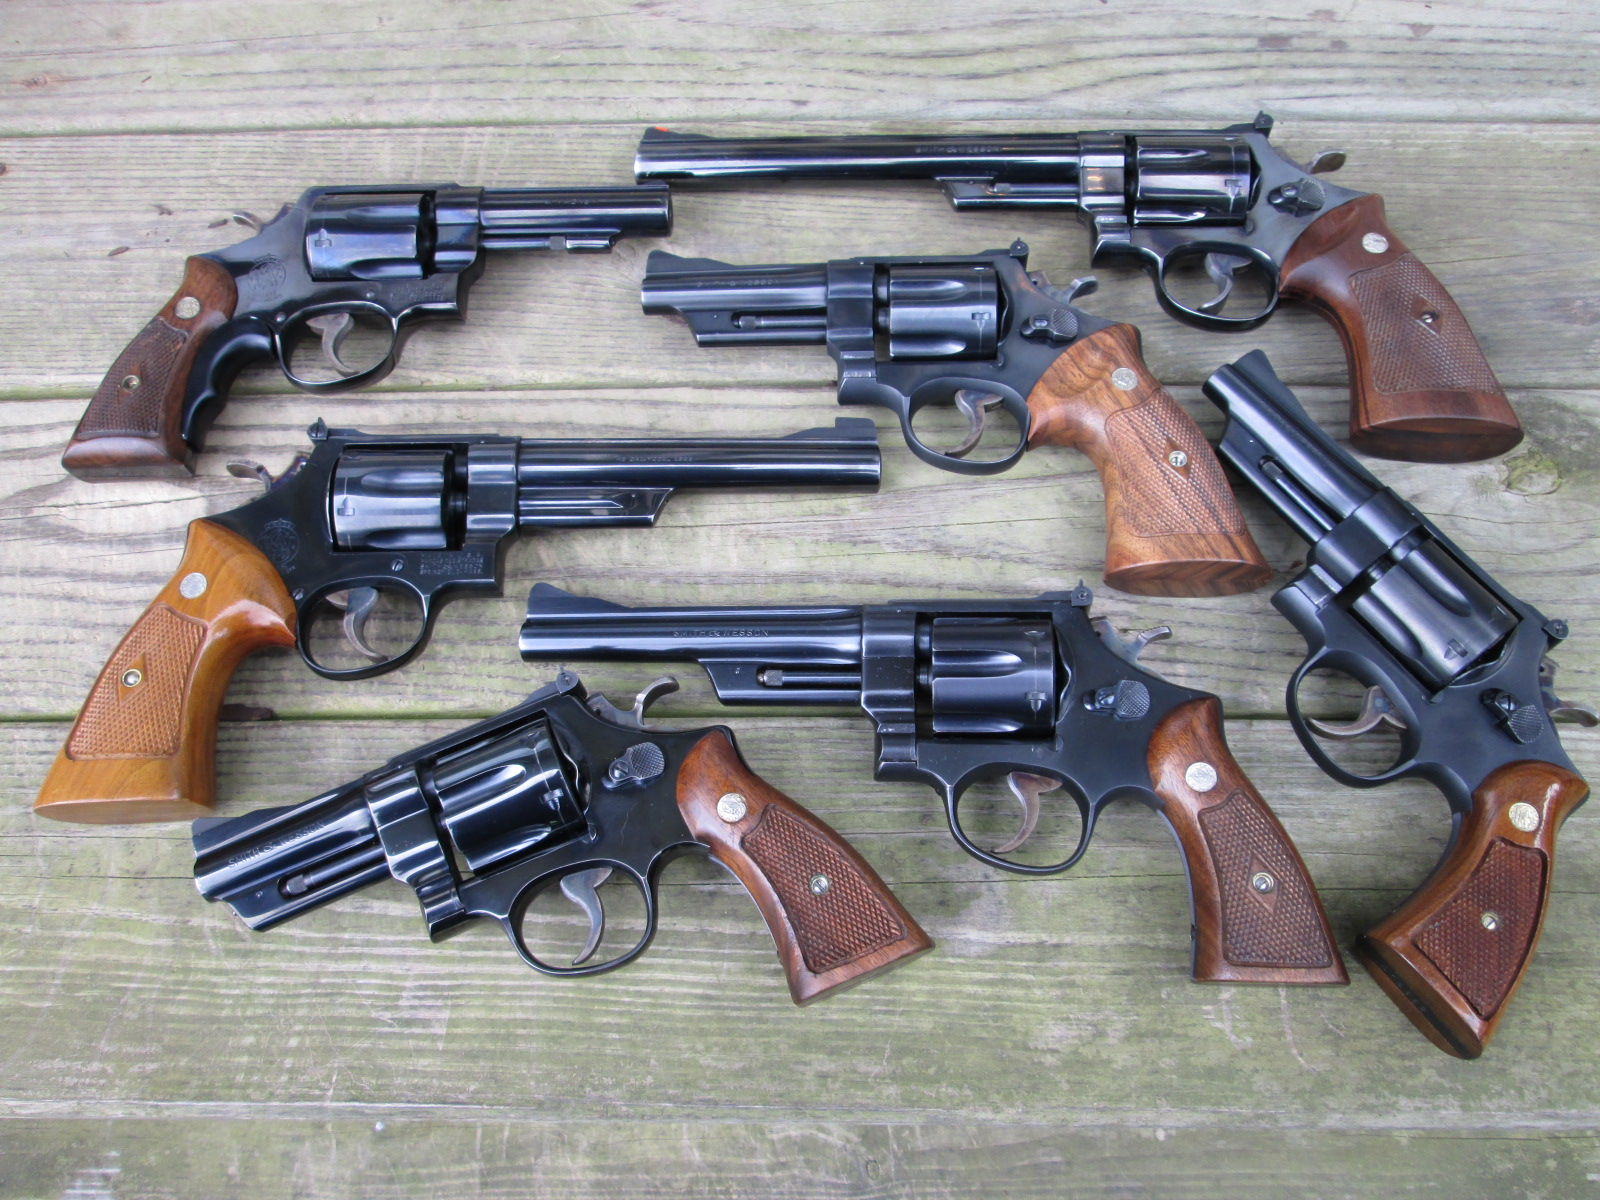 I am talkng S&W N-frame revolvers (or whatever else)